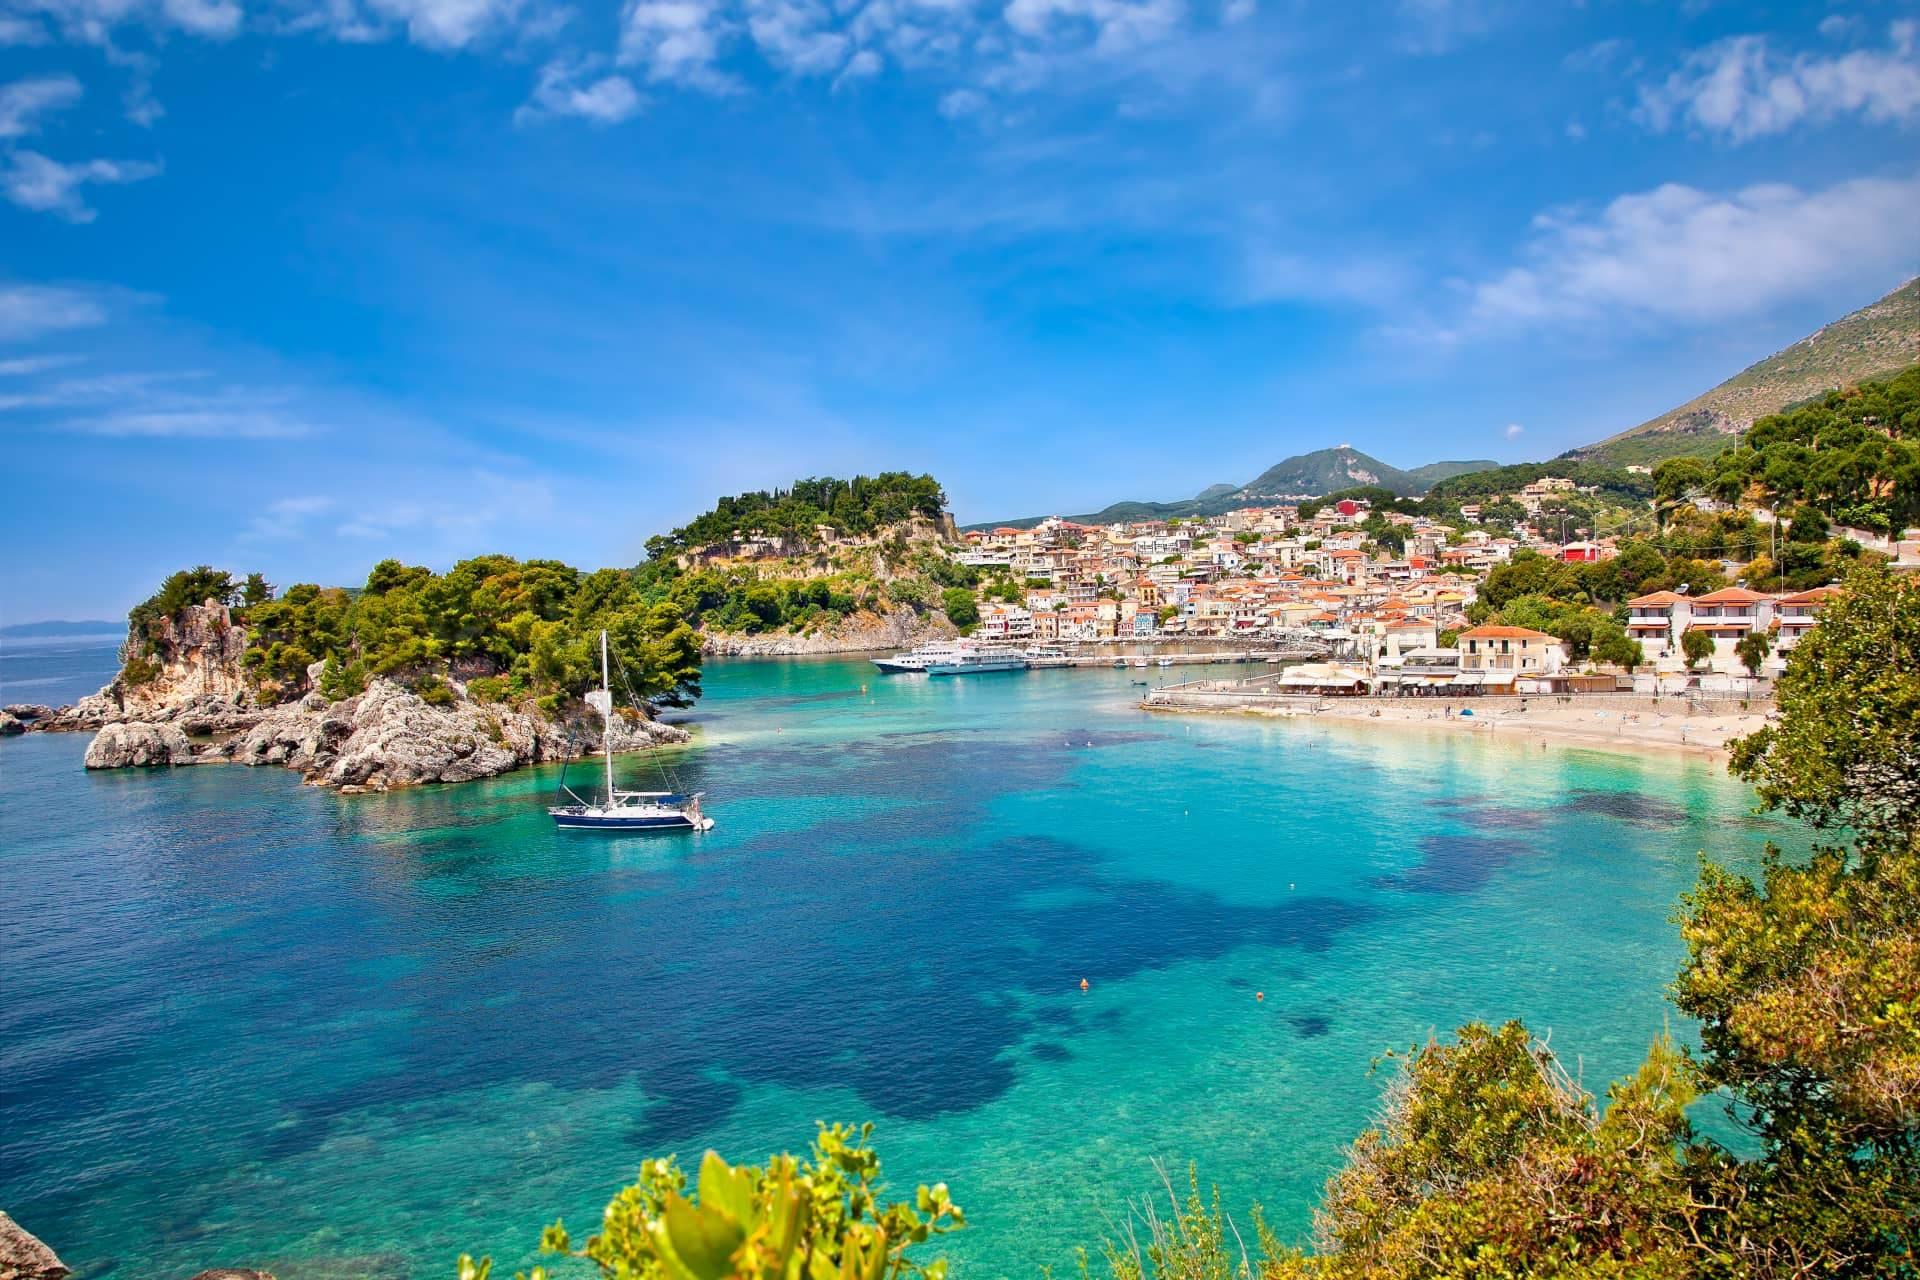 Property for Sale in Greece - Buy Greek Property